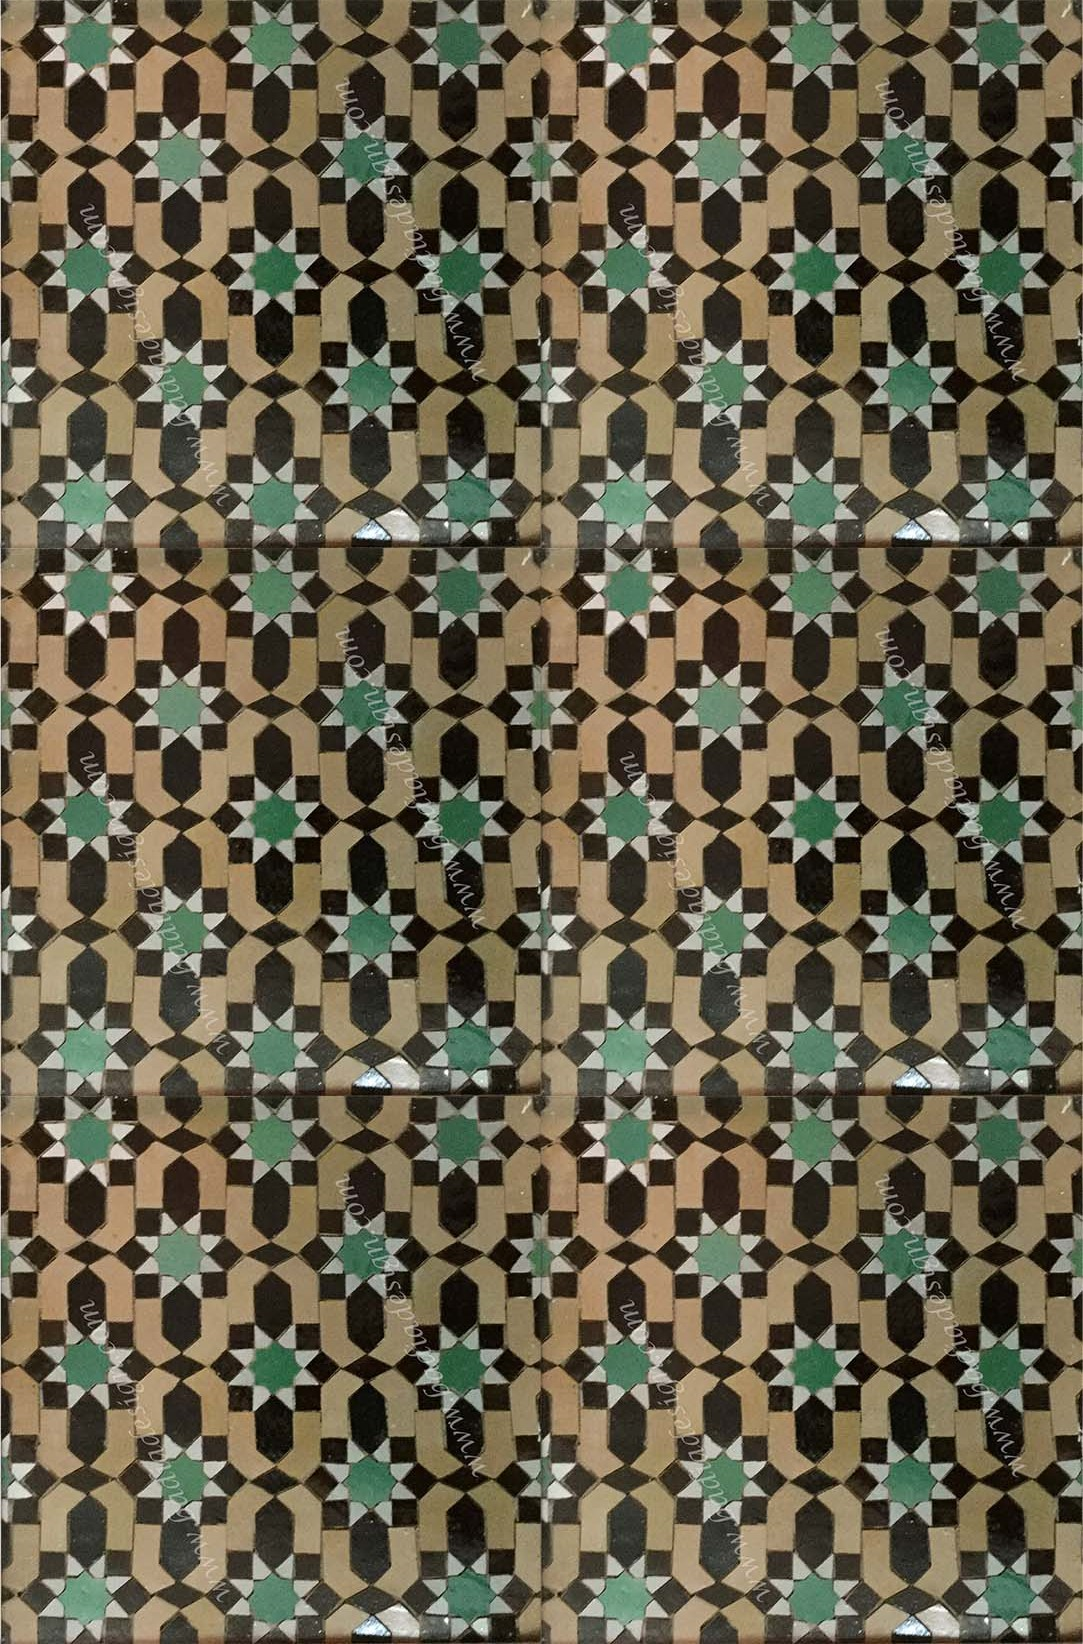 moroccan-tile-badia-design-tm053-2a.jpg